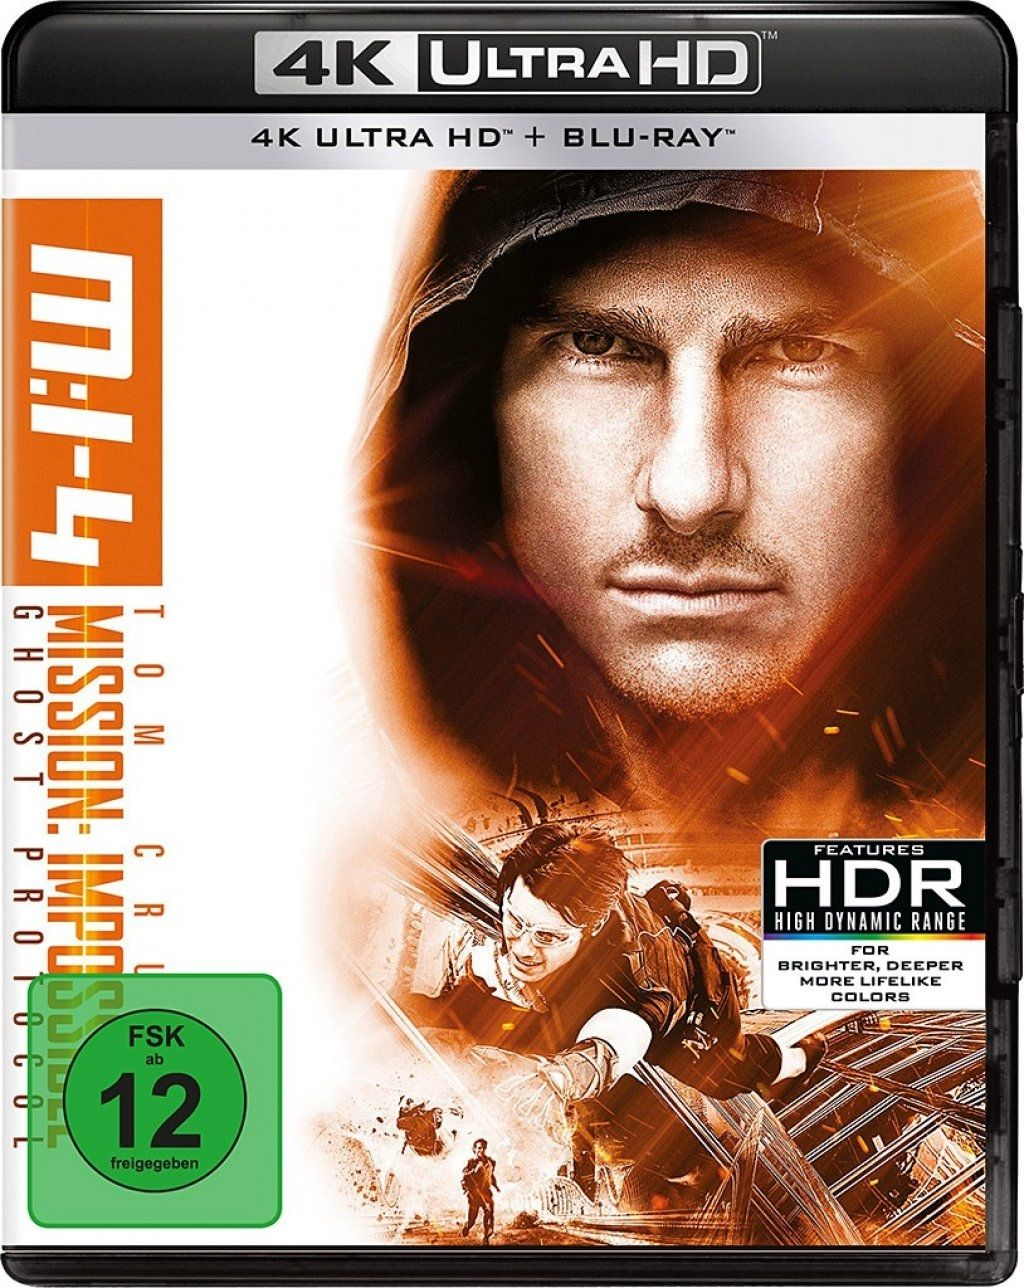 Mission: Impossible - Phantom Protokoll (2 Discs) (UHD BLURAY + BLURAY)